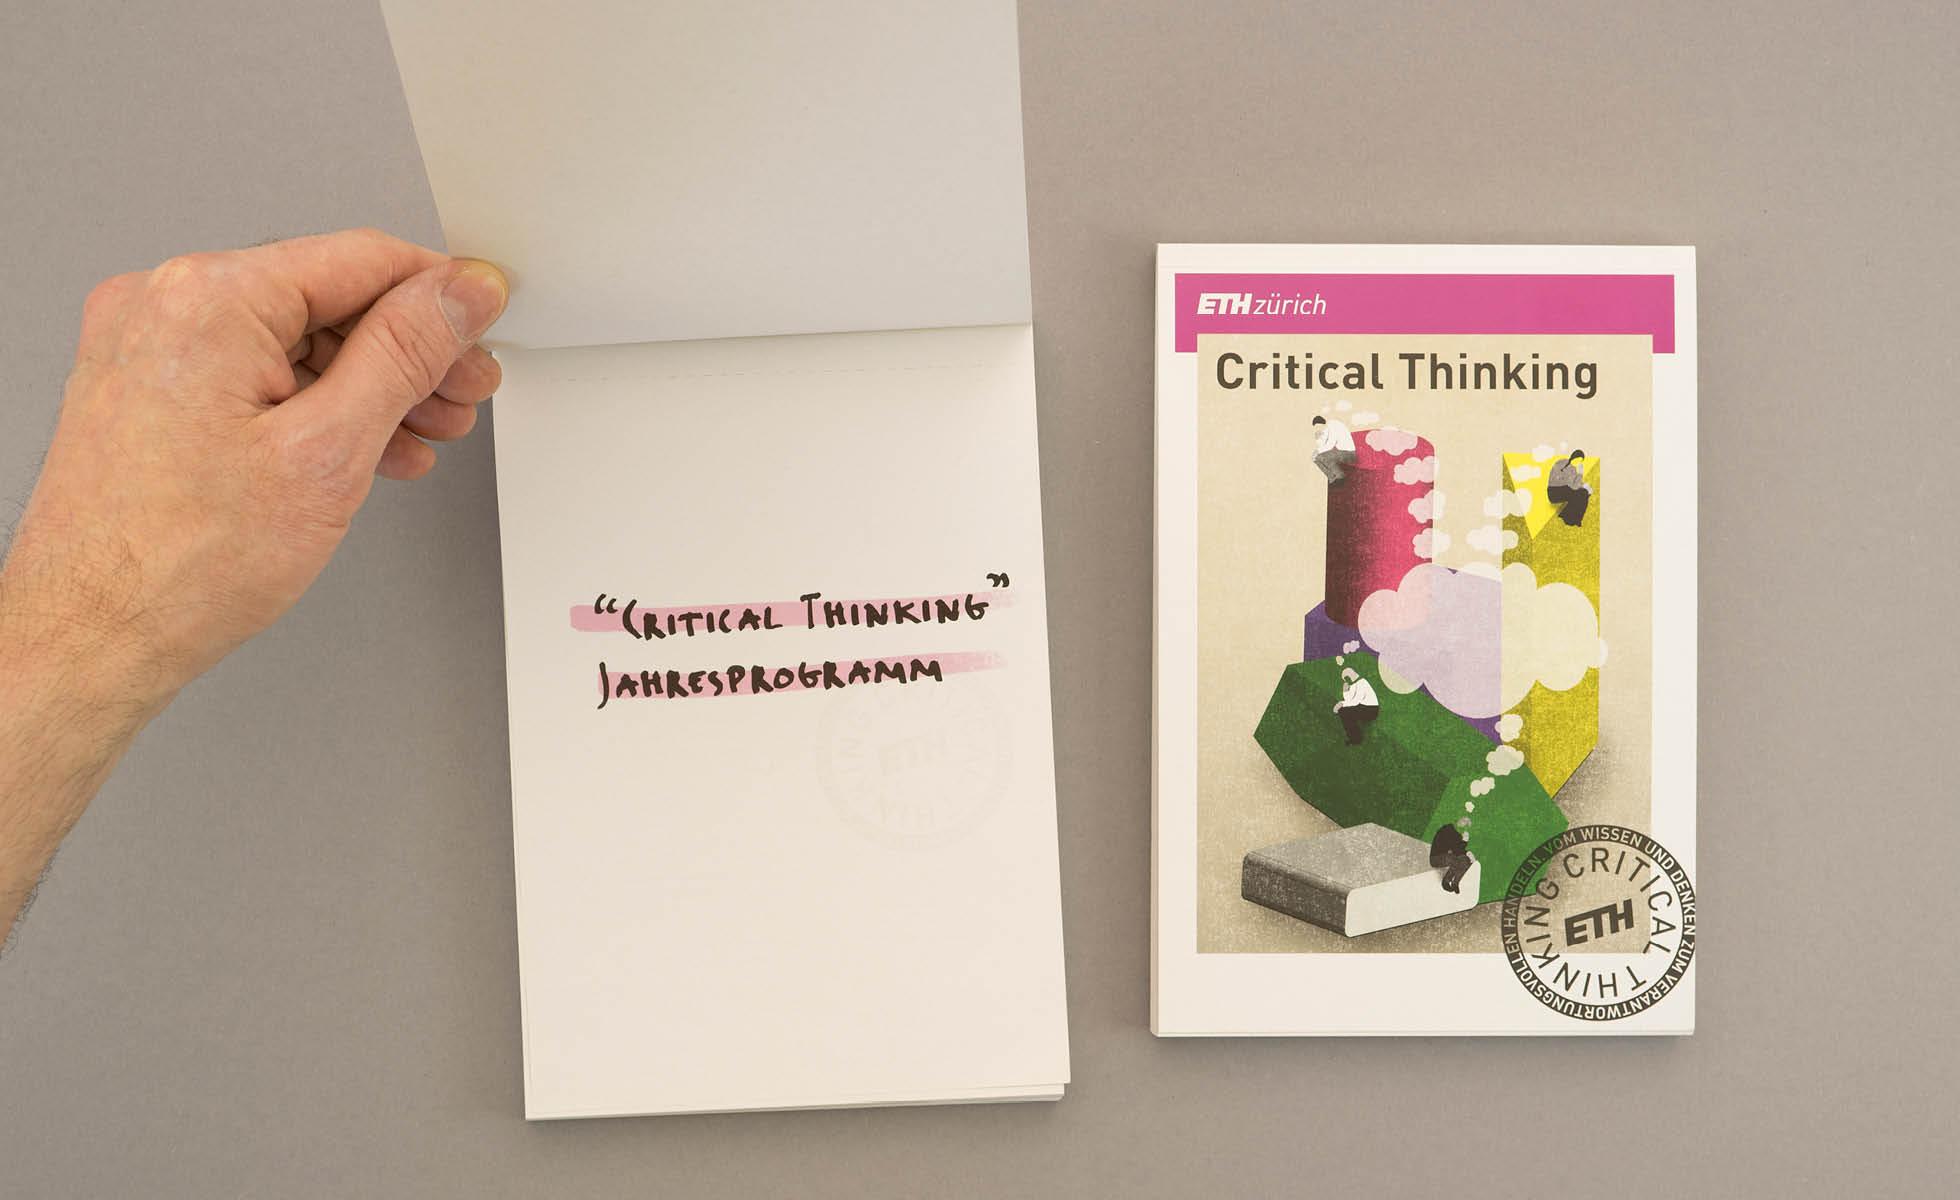 critical_thinking_01_eth_02